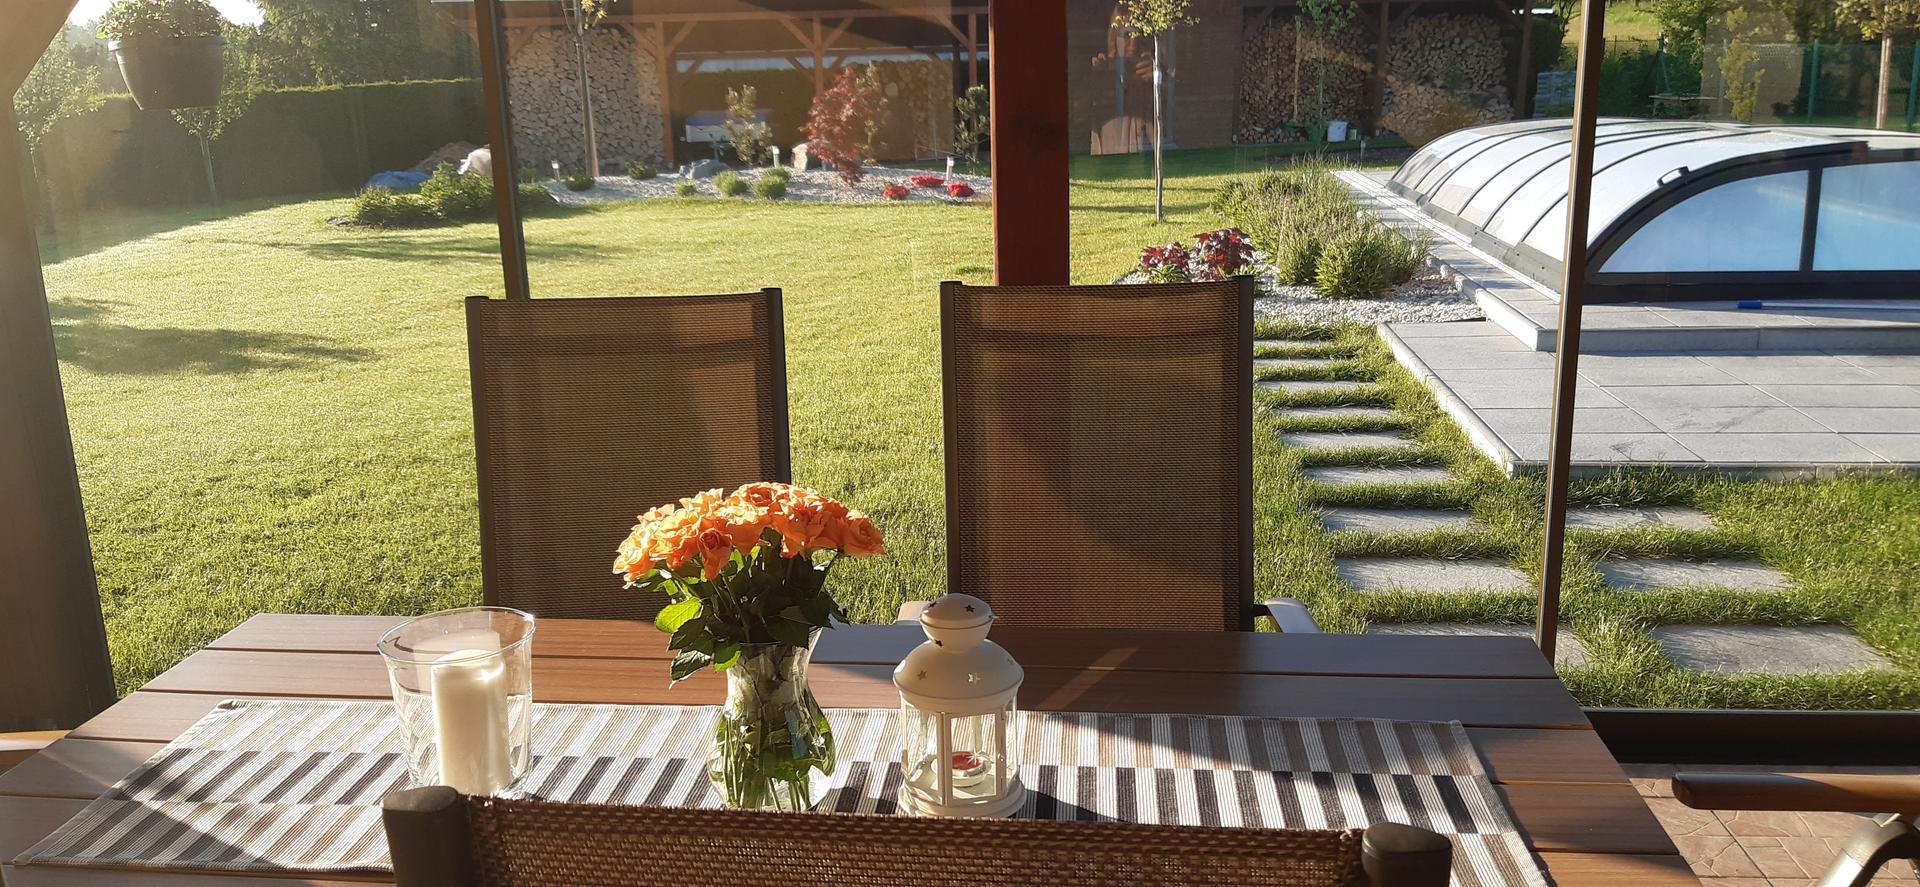 Zahrada 2021 - Ranní slunce na terase